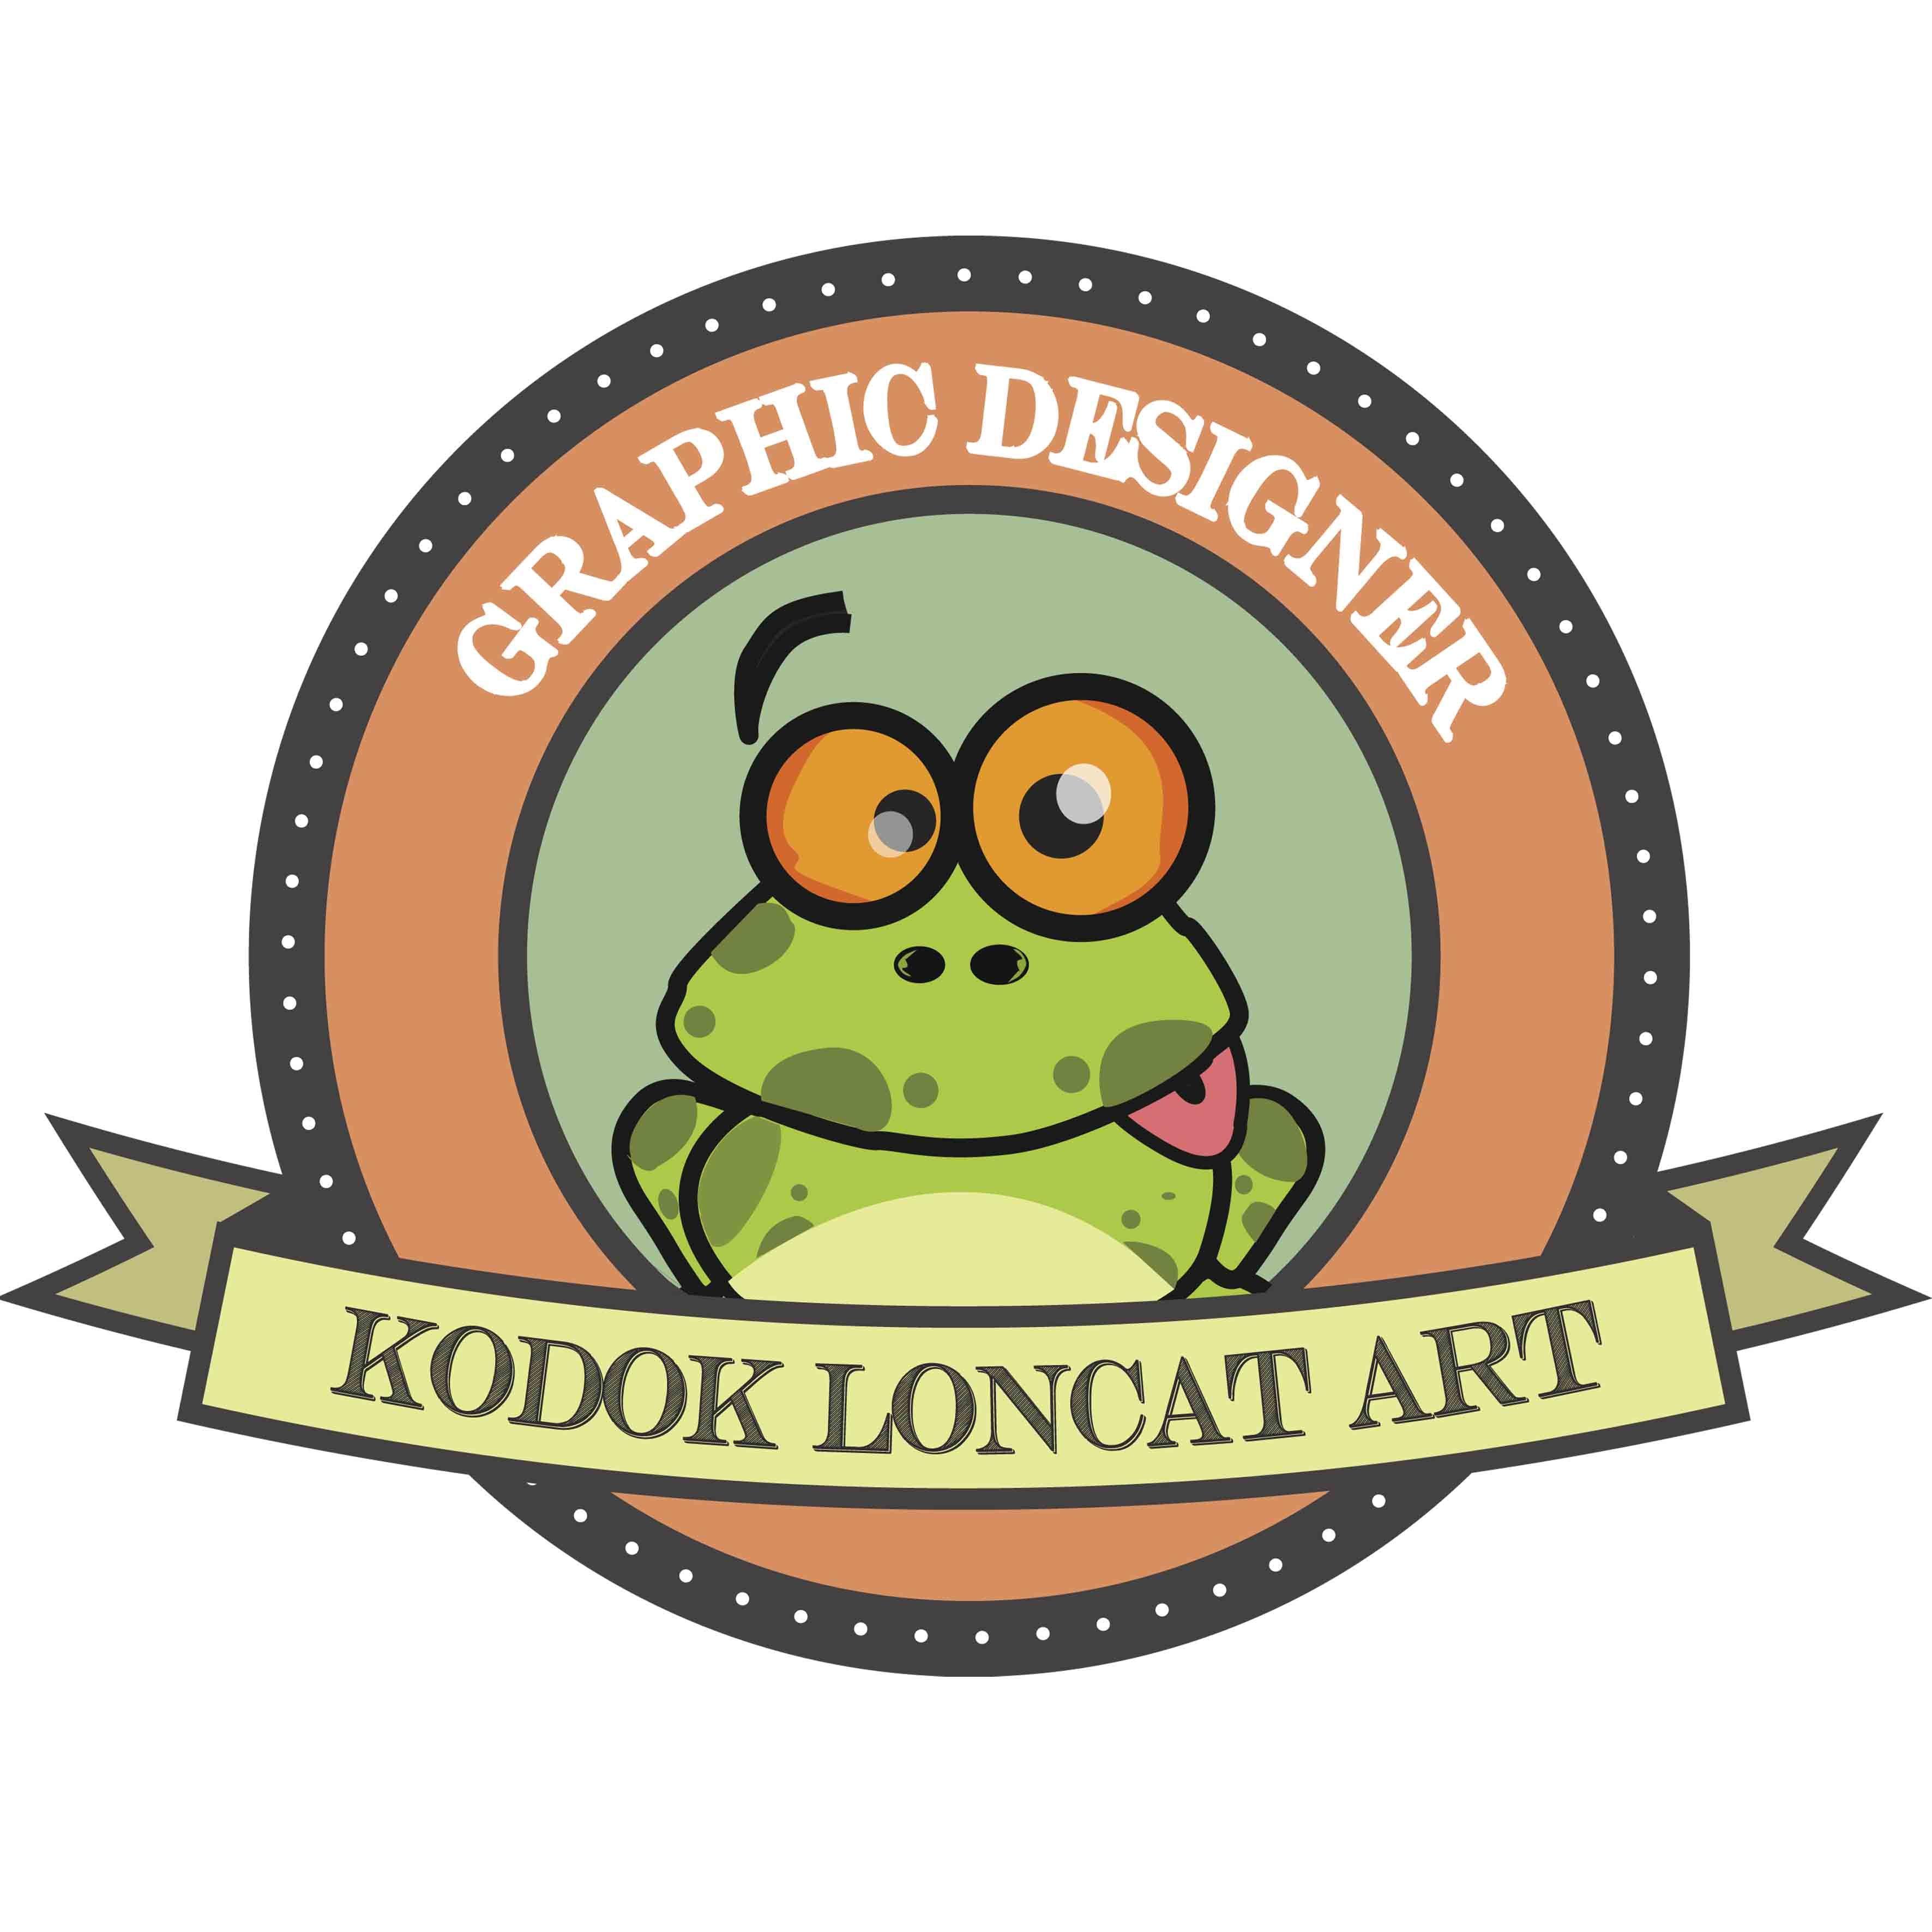 Media Tweets By Kodok Loncat Art At Kodokloncatart Twitter